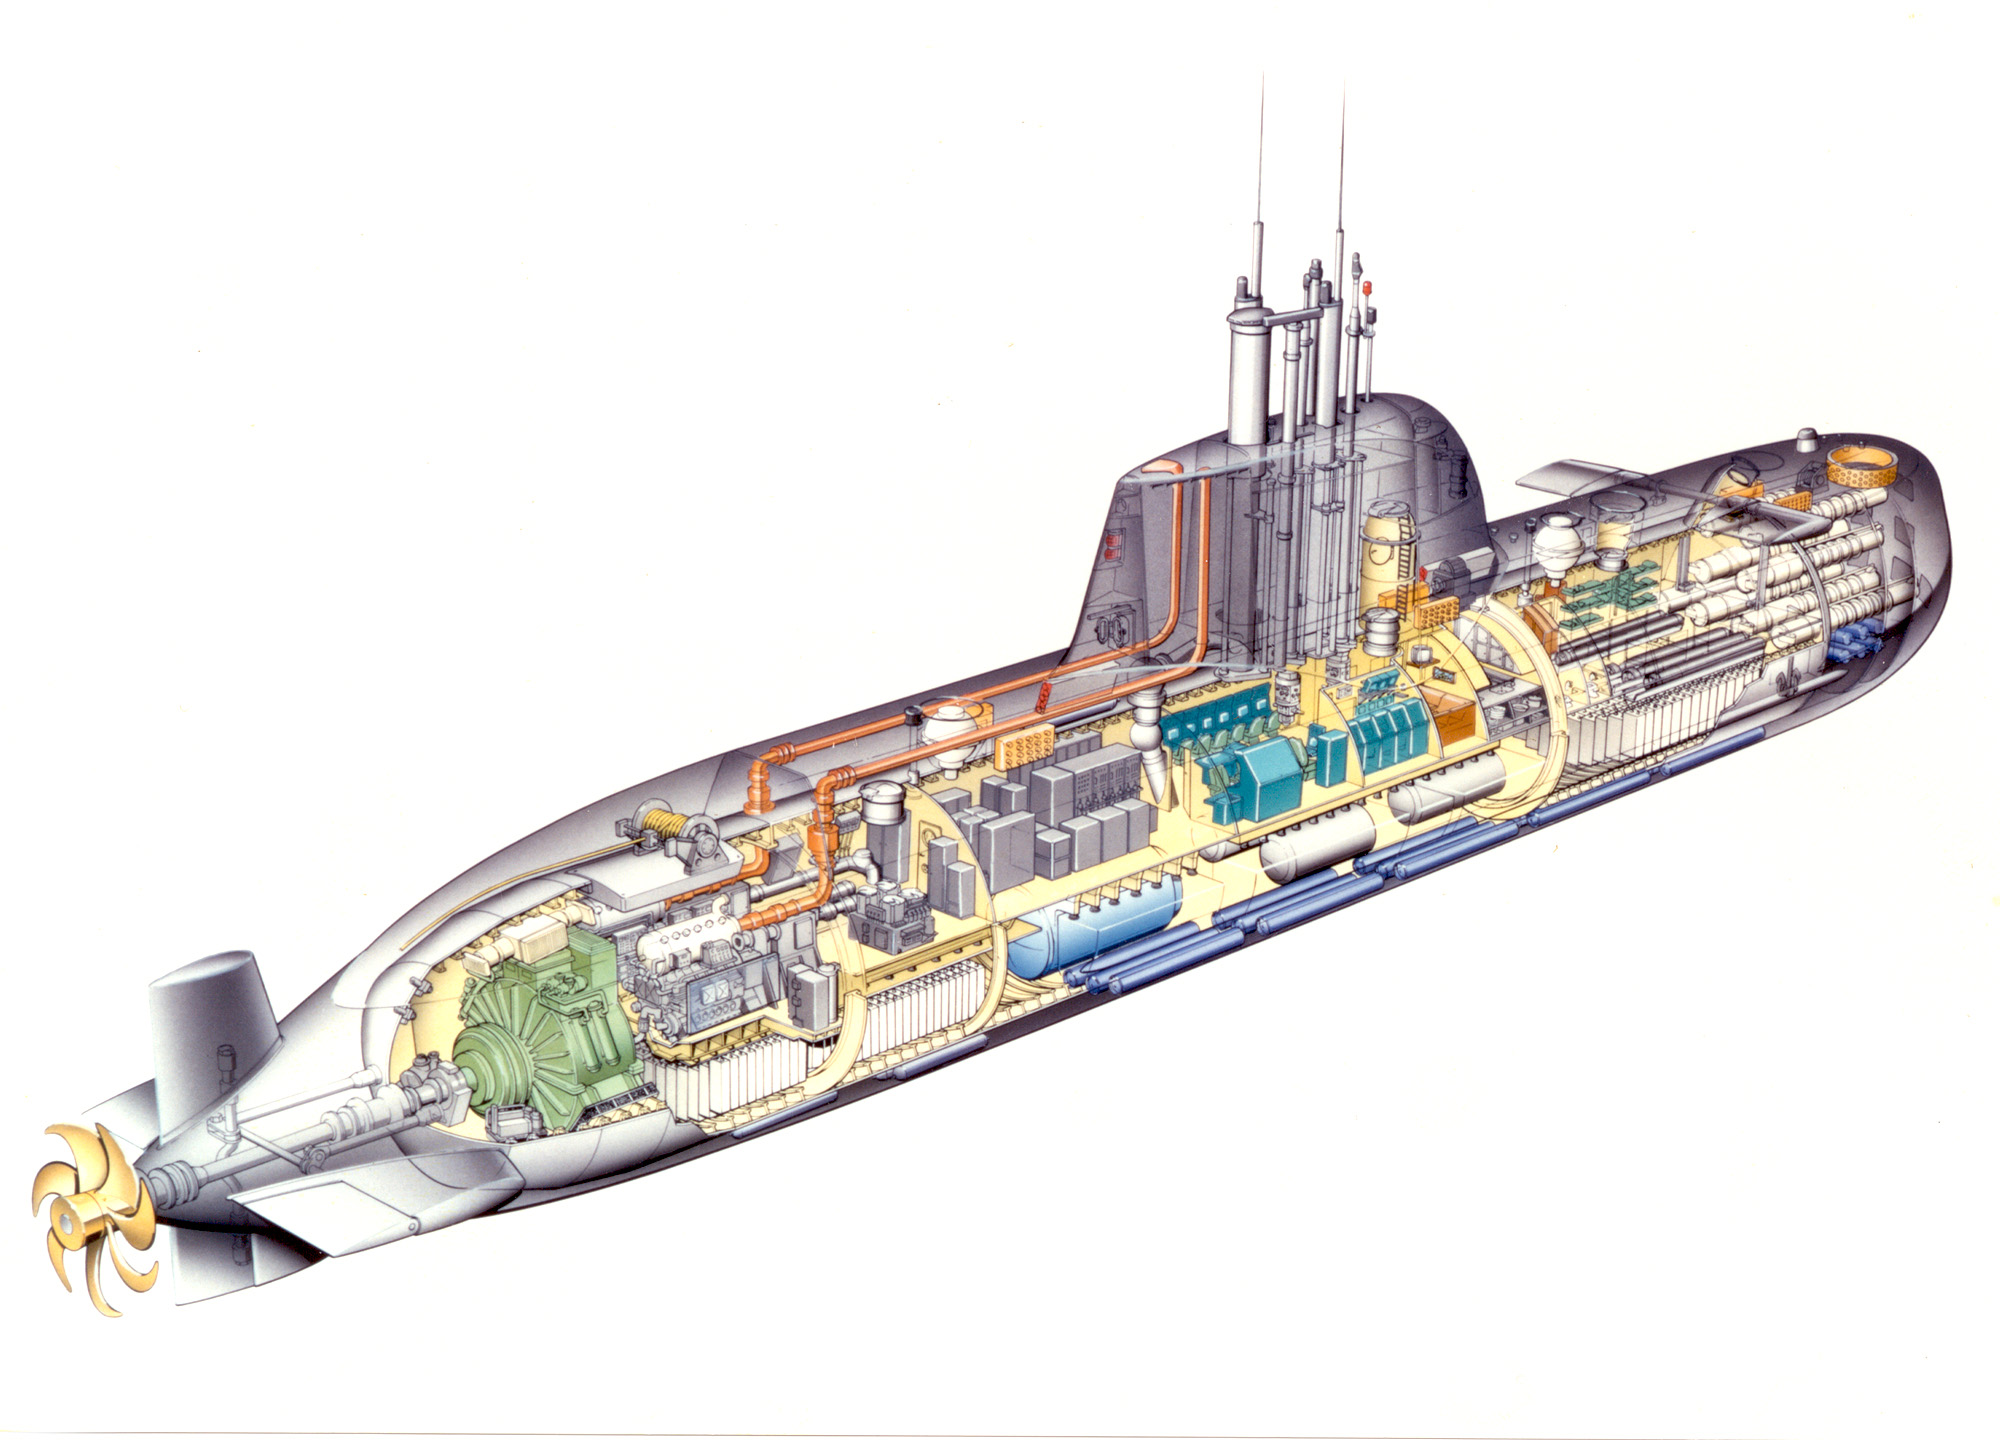 https://i0.wp.com/www.naval.com.br/blog/wp-content/uploads/2008/12/u-214-schnittbild.jpg